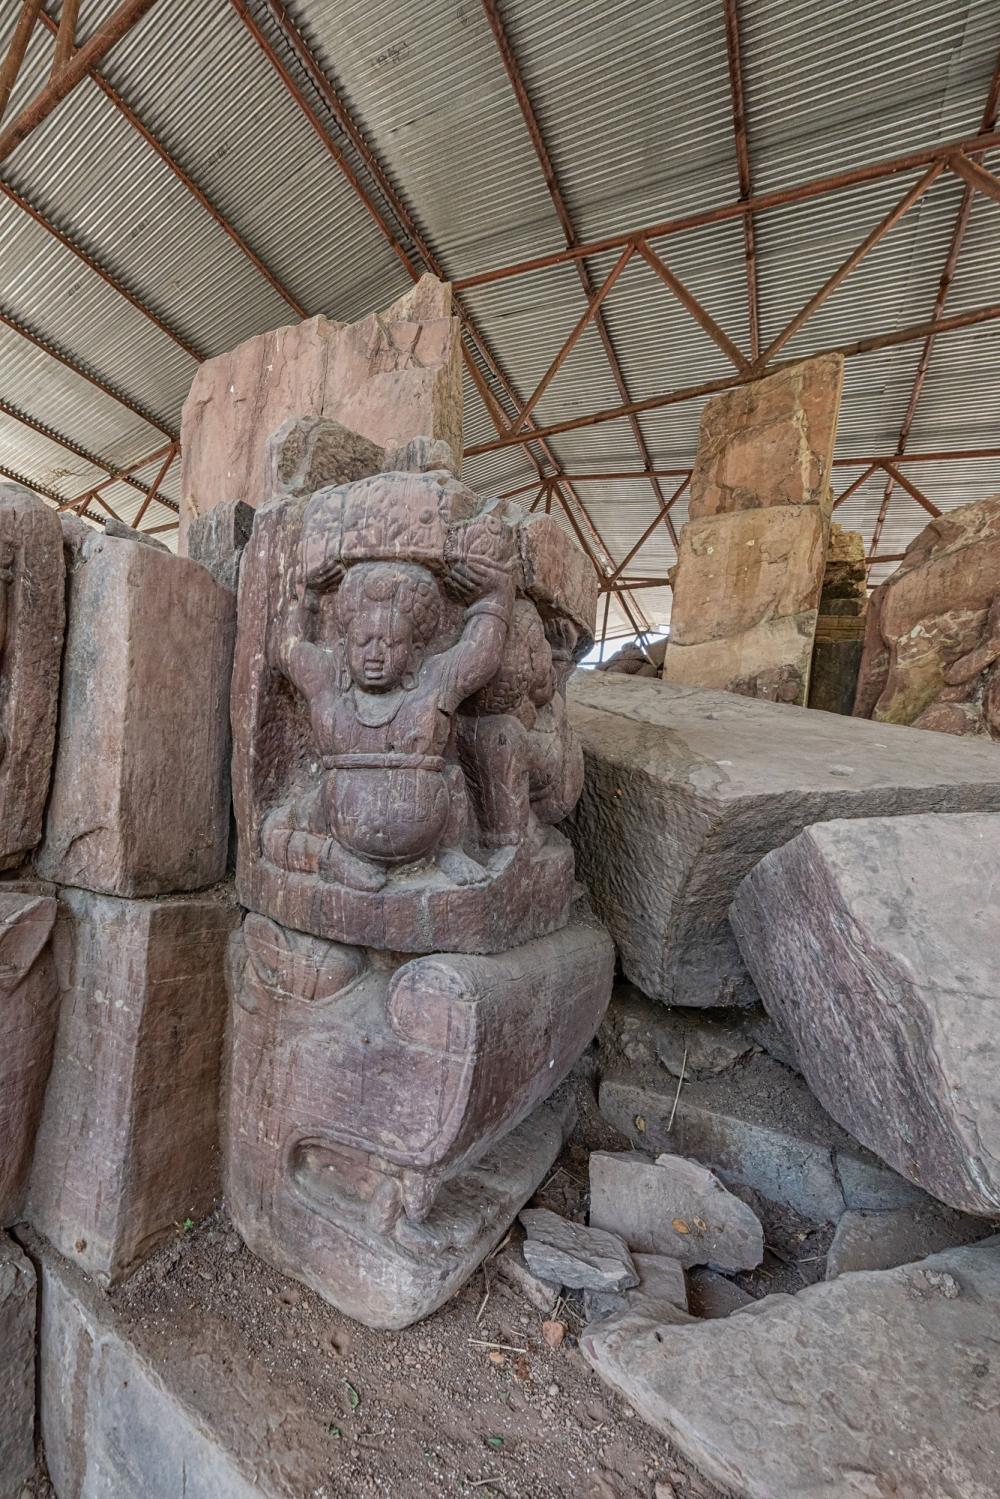 Jethani temple, load bearer